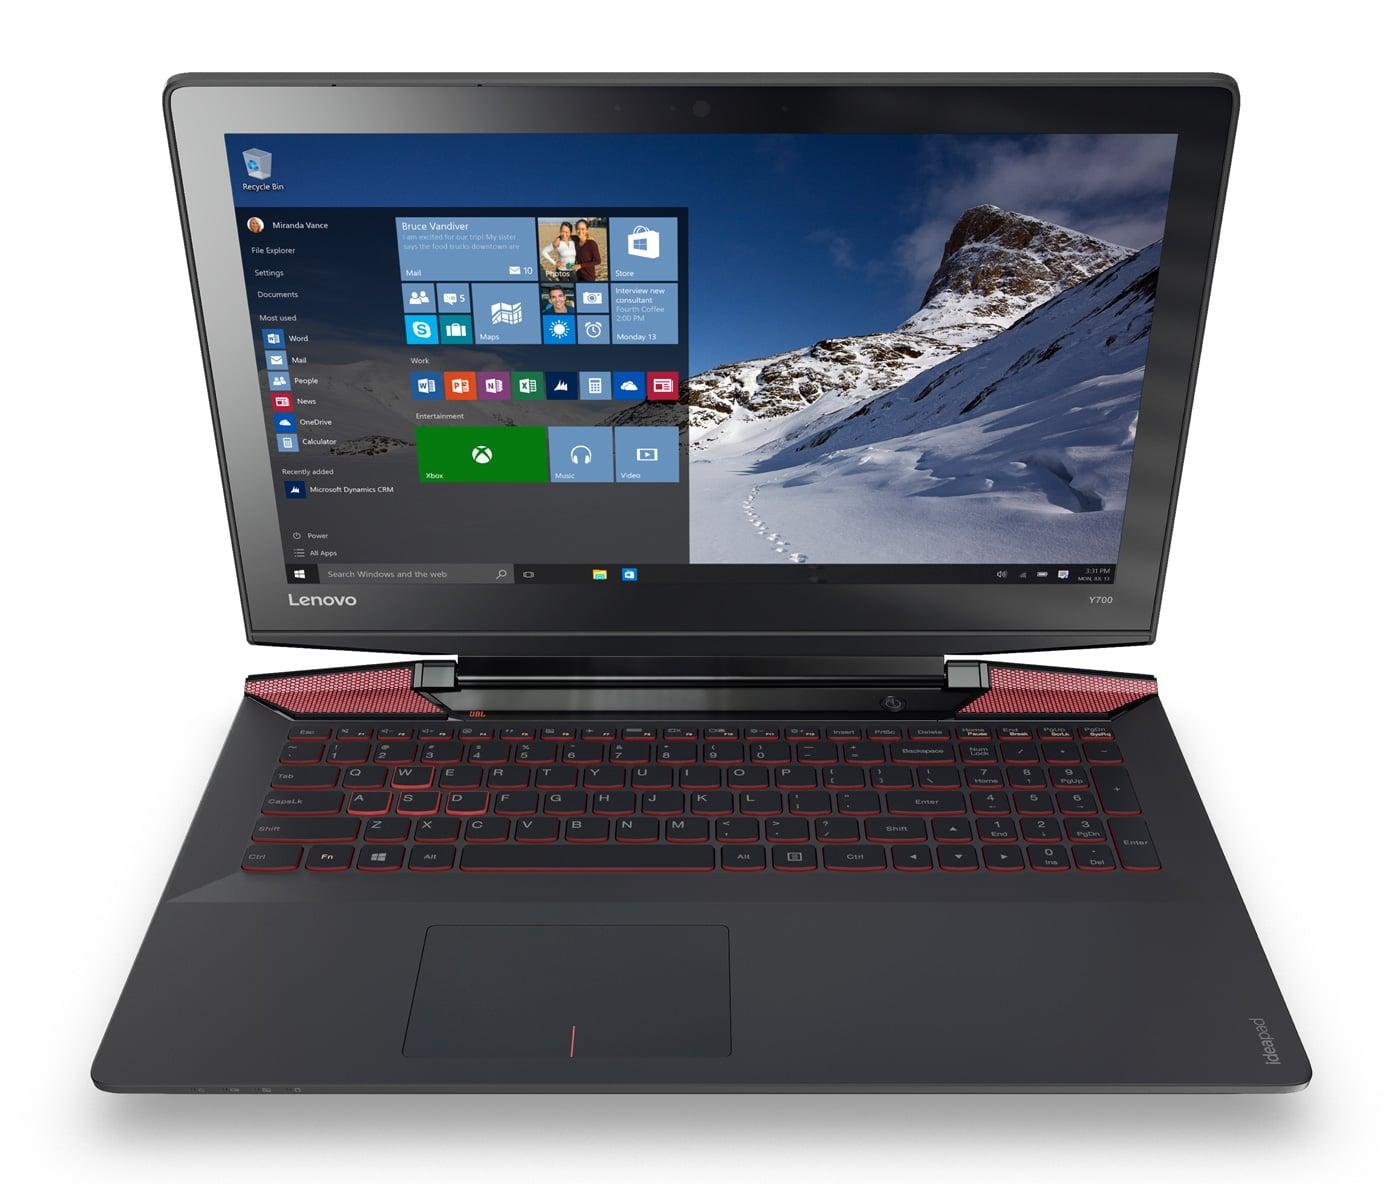 "<span class=""toptagtitre"">Promo 689€ ! </span>Lenovo IdeaPad Y700-15ISK, PC portable joueur 15"" 960M"